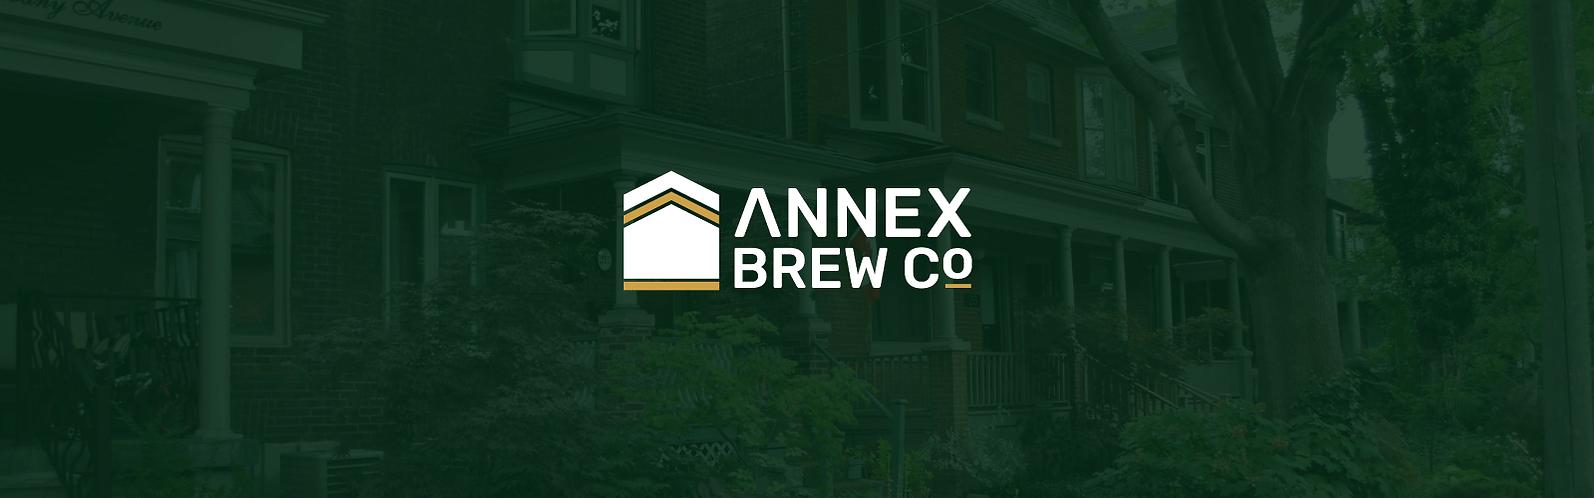 annex brew co brand design